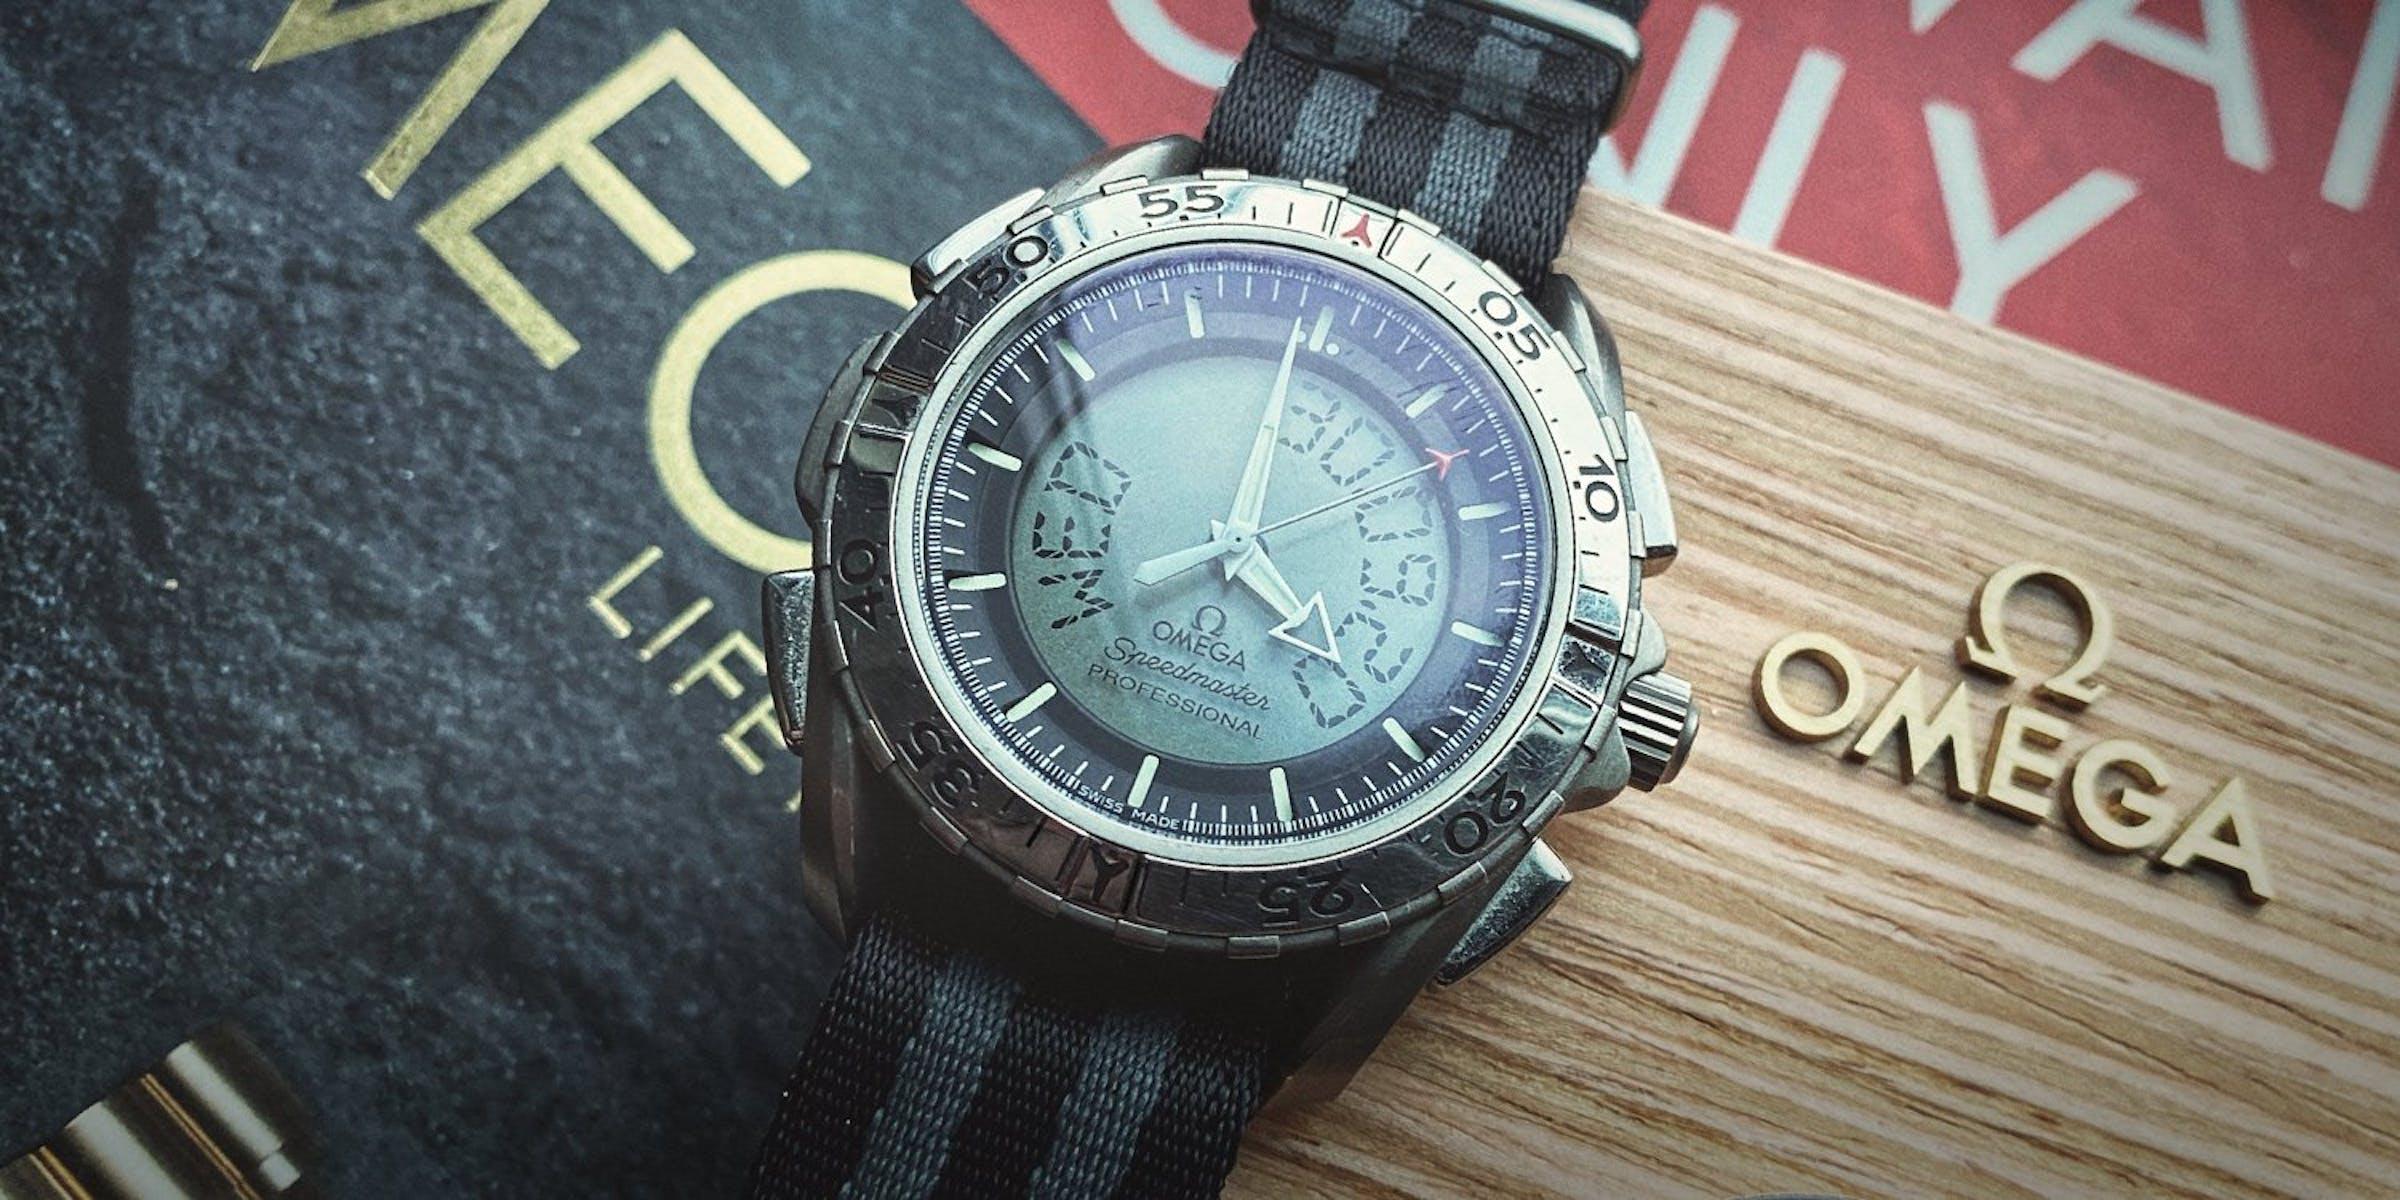 CAM-1423-24h-on-the-wrist-2-1